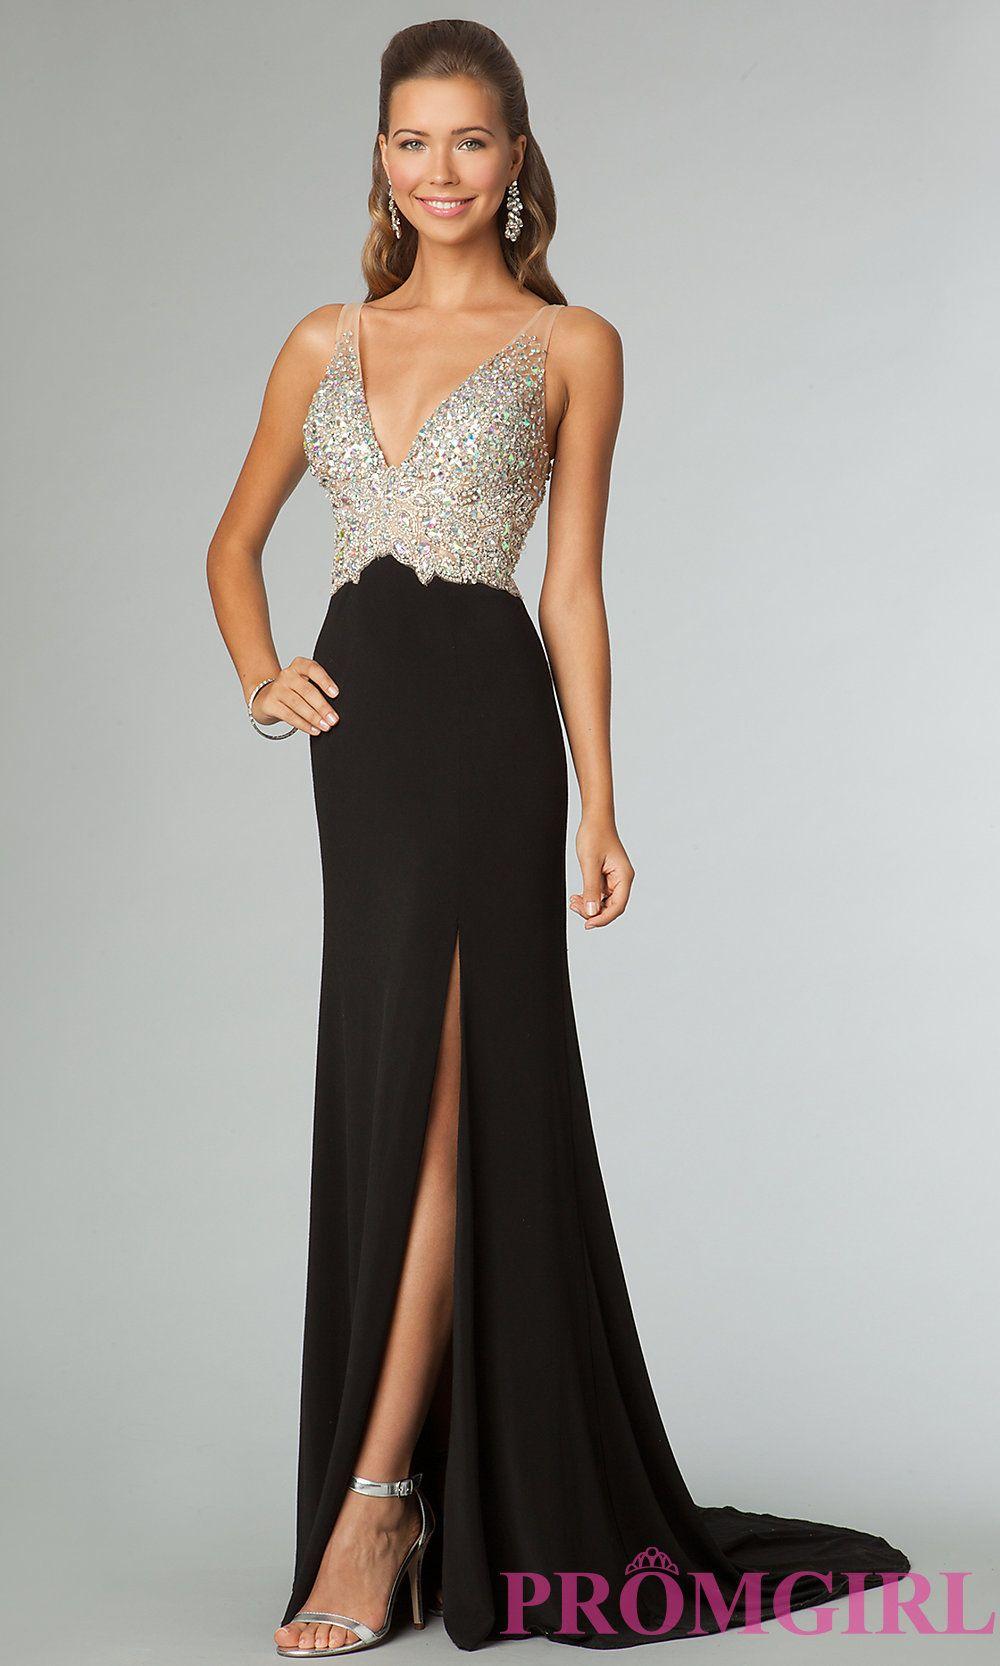 Sequin prom gowns jvn long sequin dresses promgirl dance